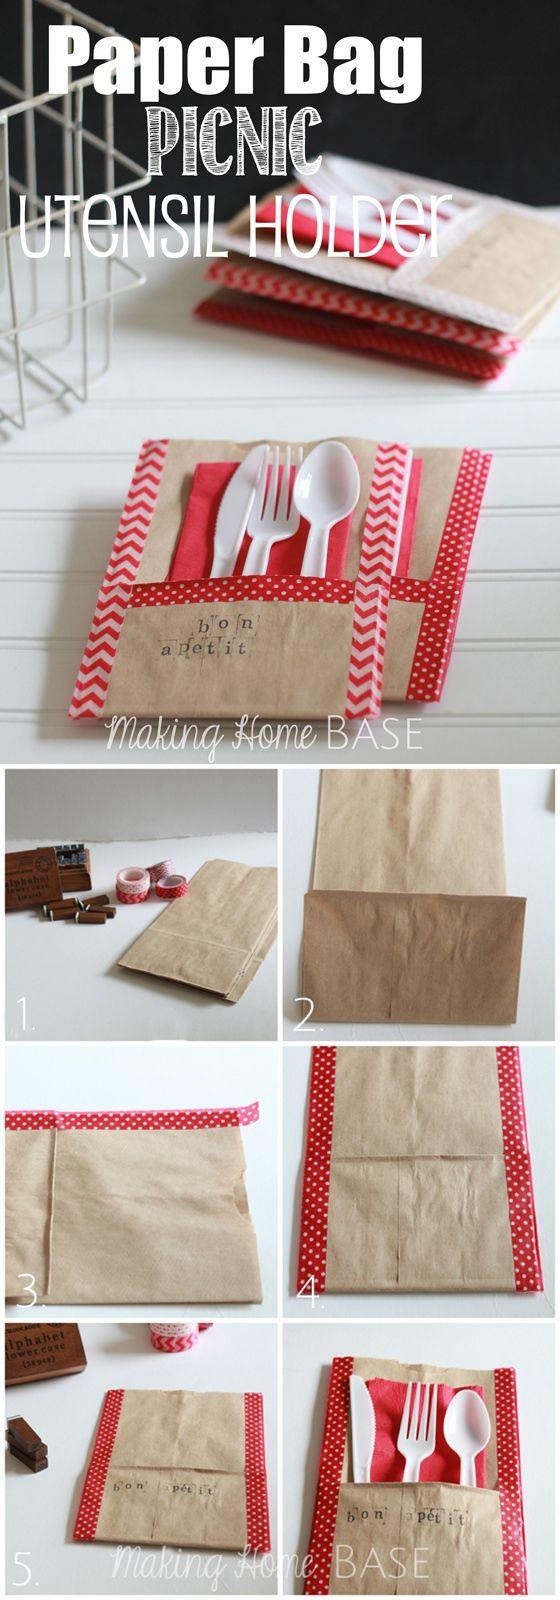 Washi Tape and Paper Bag Picnic Utensil Holder . . .